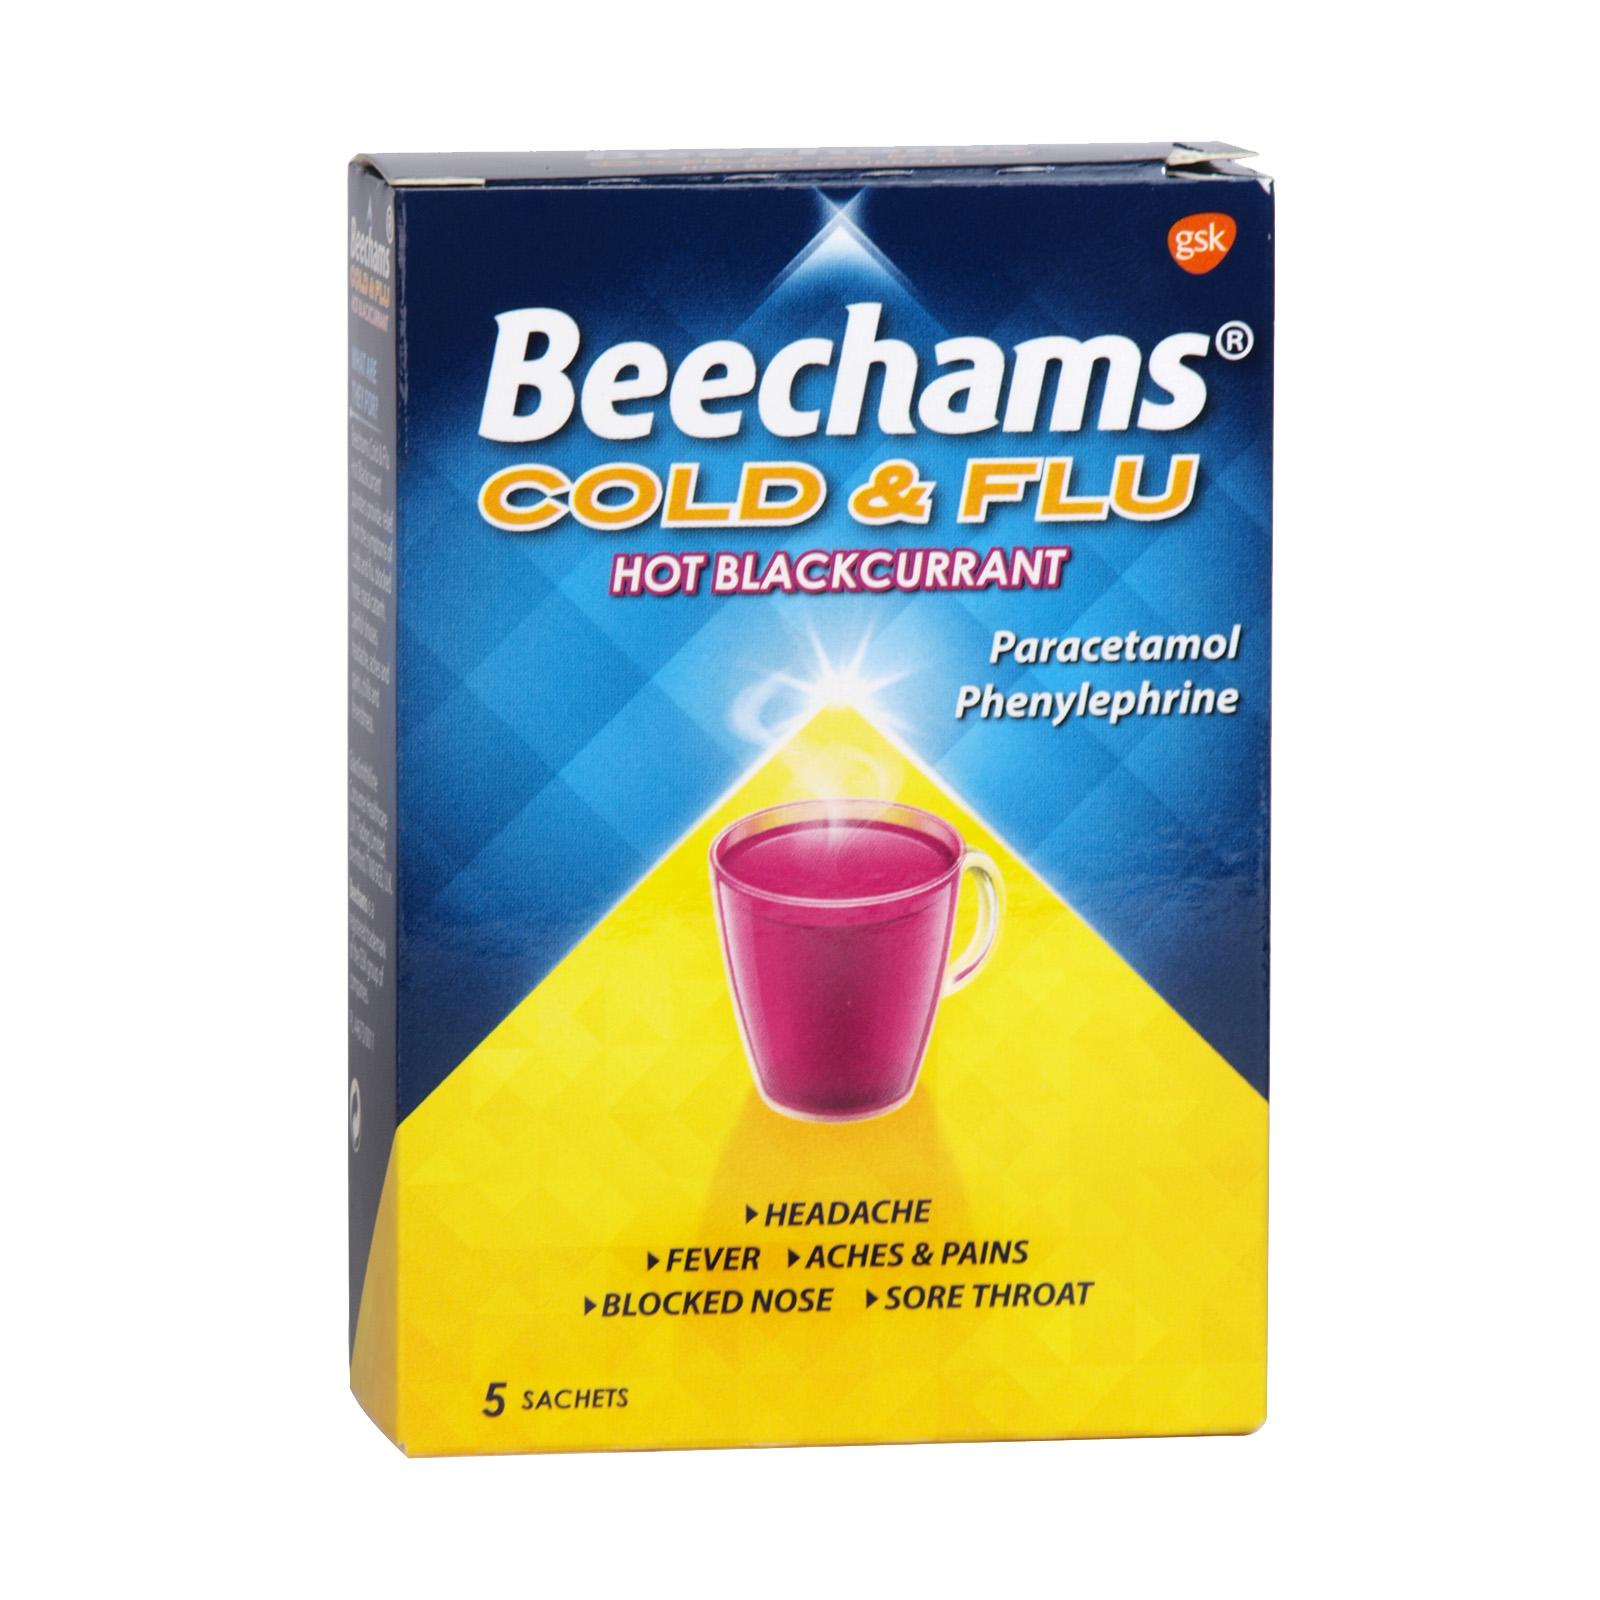 BEECHAMS COLD+FLU 5S BLACKCURRANT X6